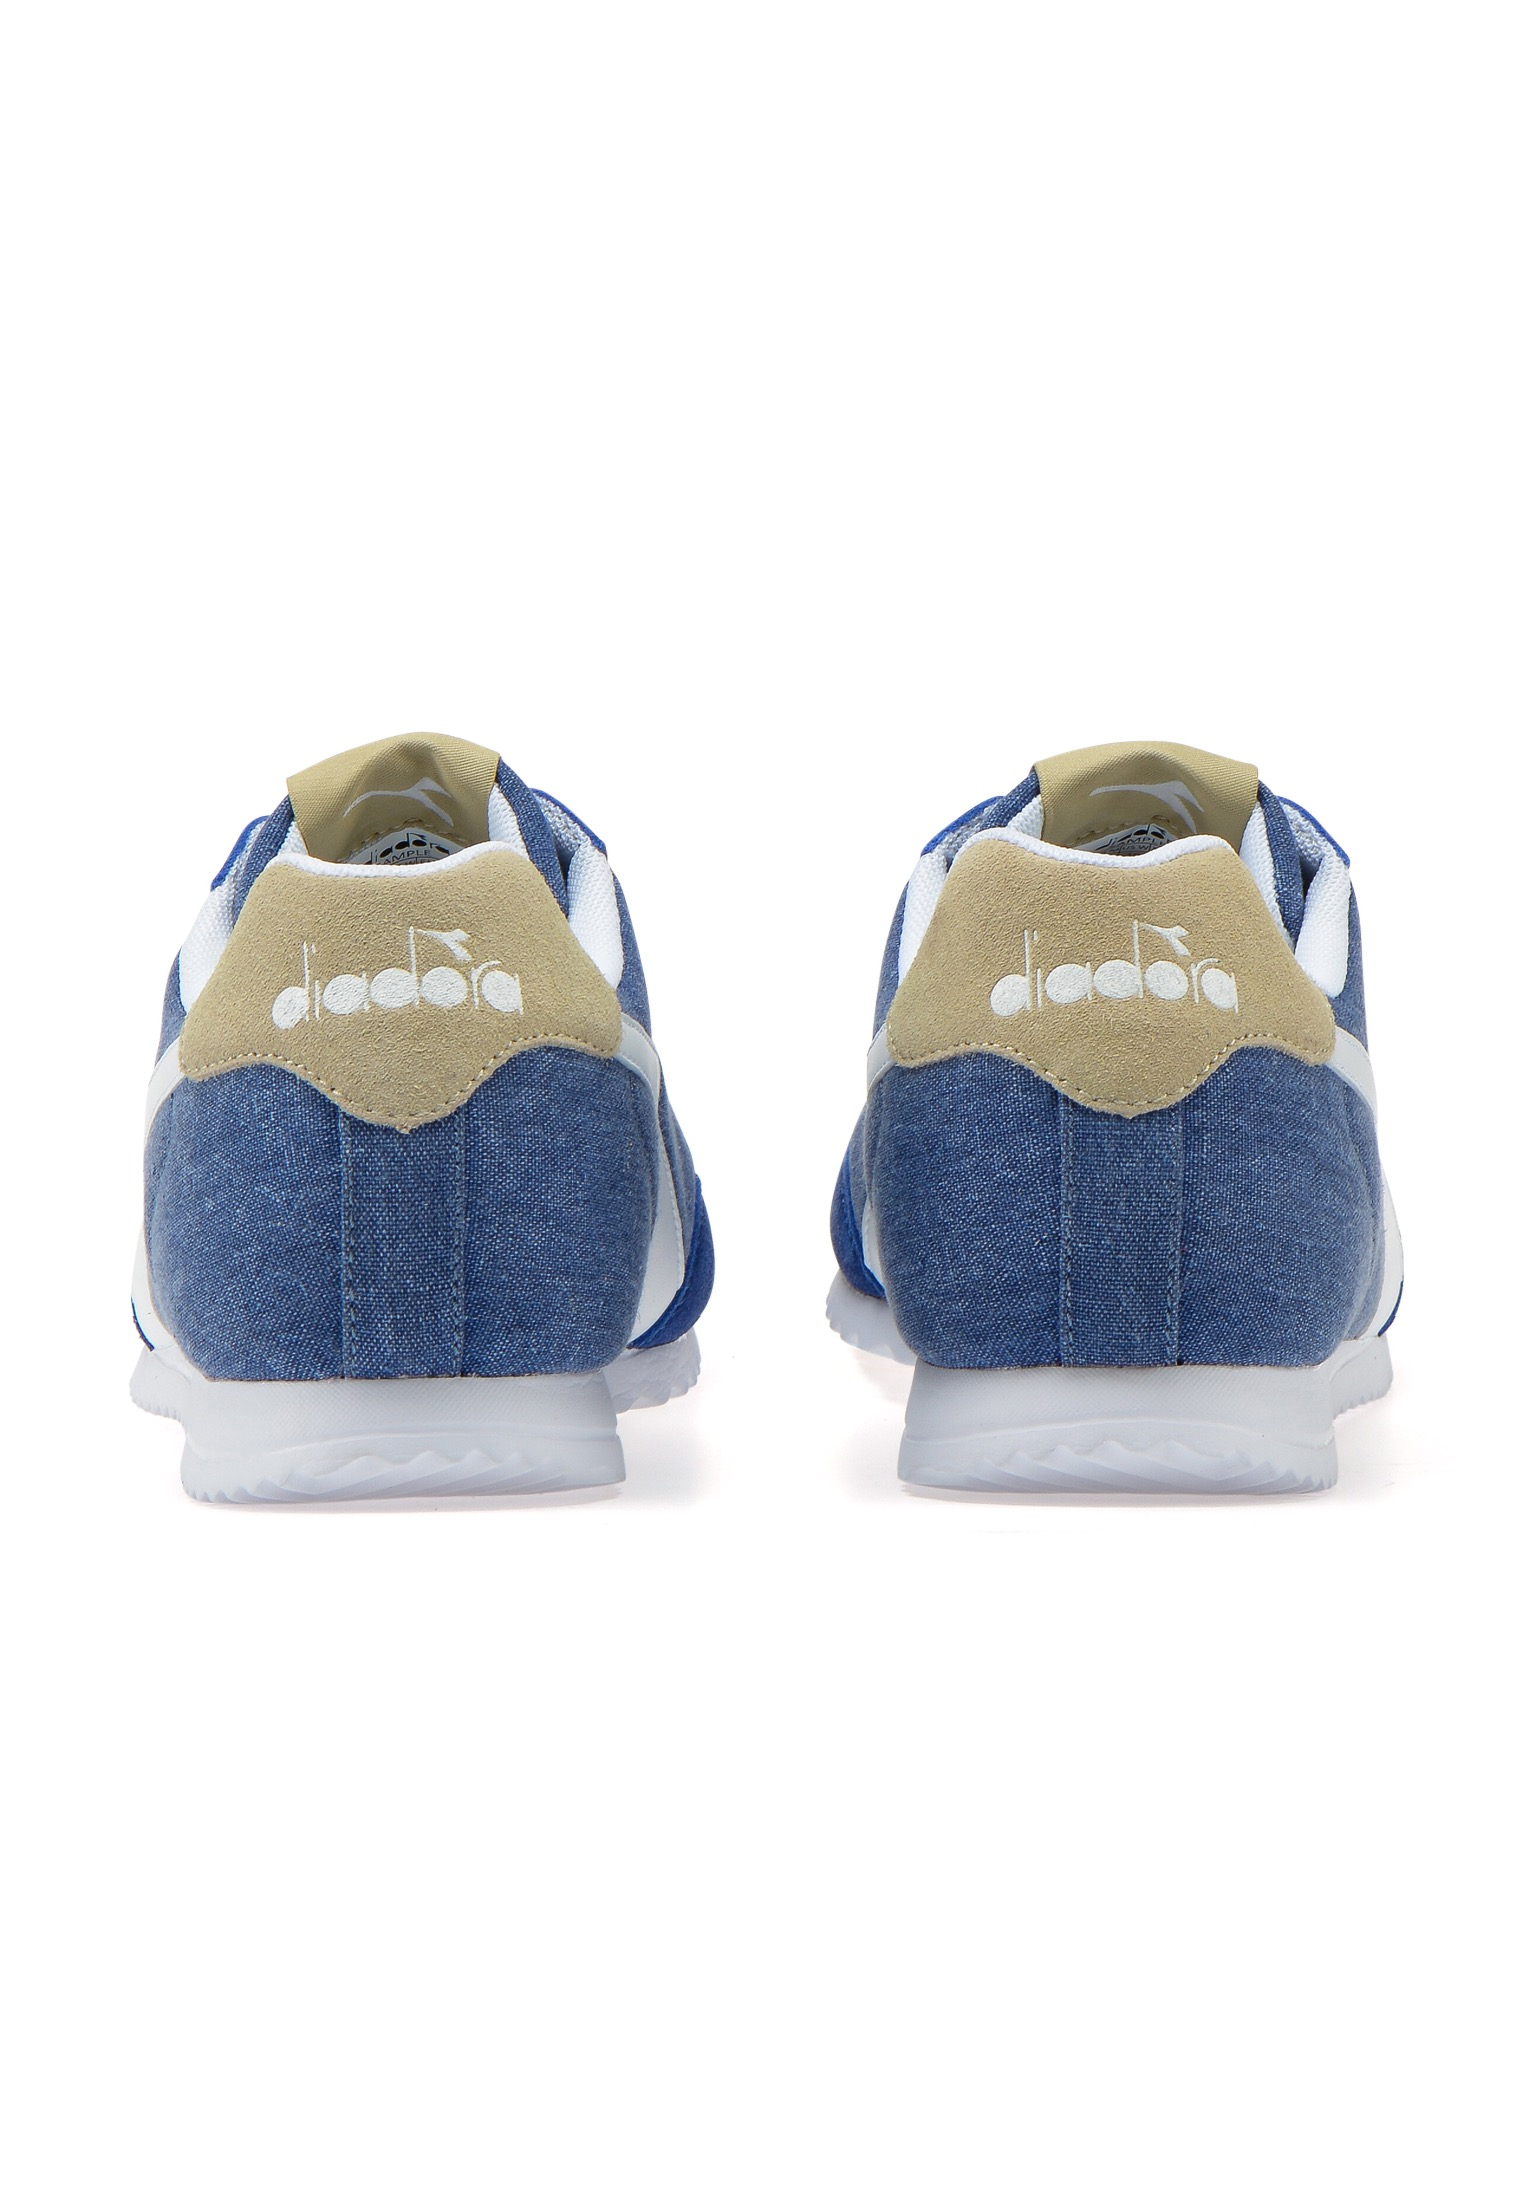 Scarpe-Diadora-Jog-Light-C-Sneakers-sportive-uomo-donna-vari-colori-e-taglie miniatura 19